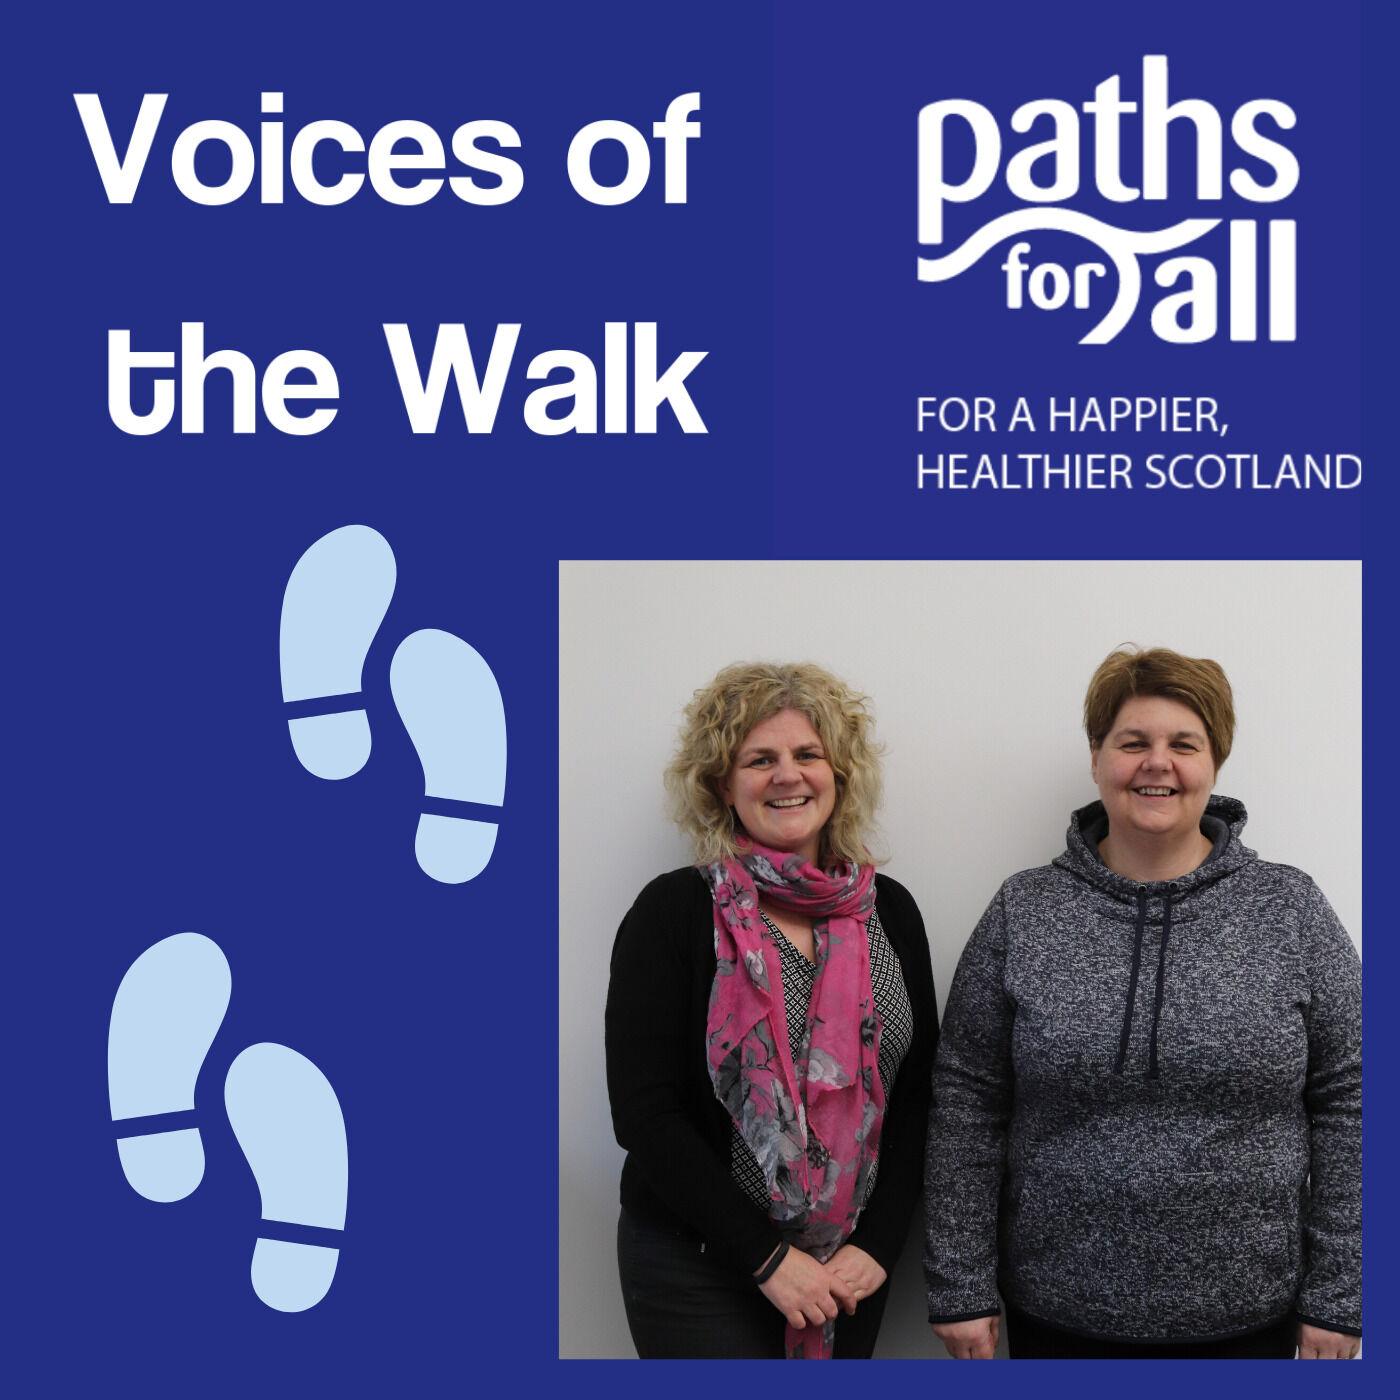 Senga McLeod and Heather Macleod: Coordinating Health Walks for 25 years